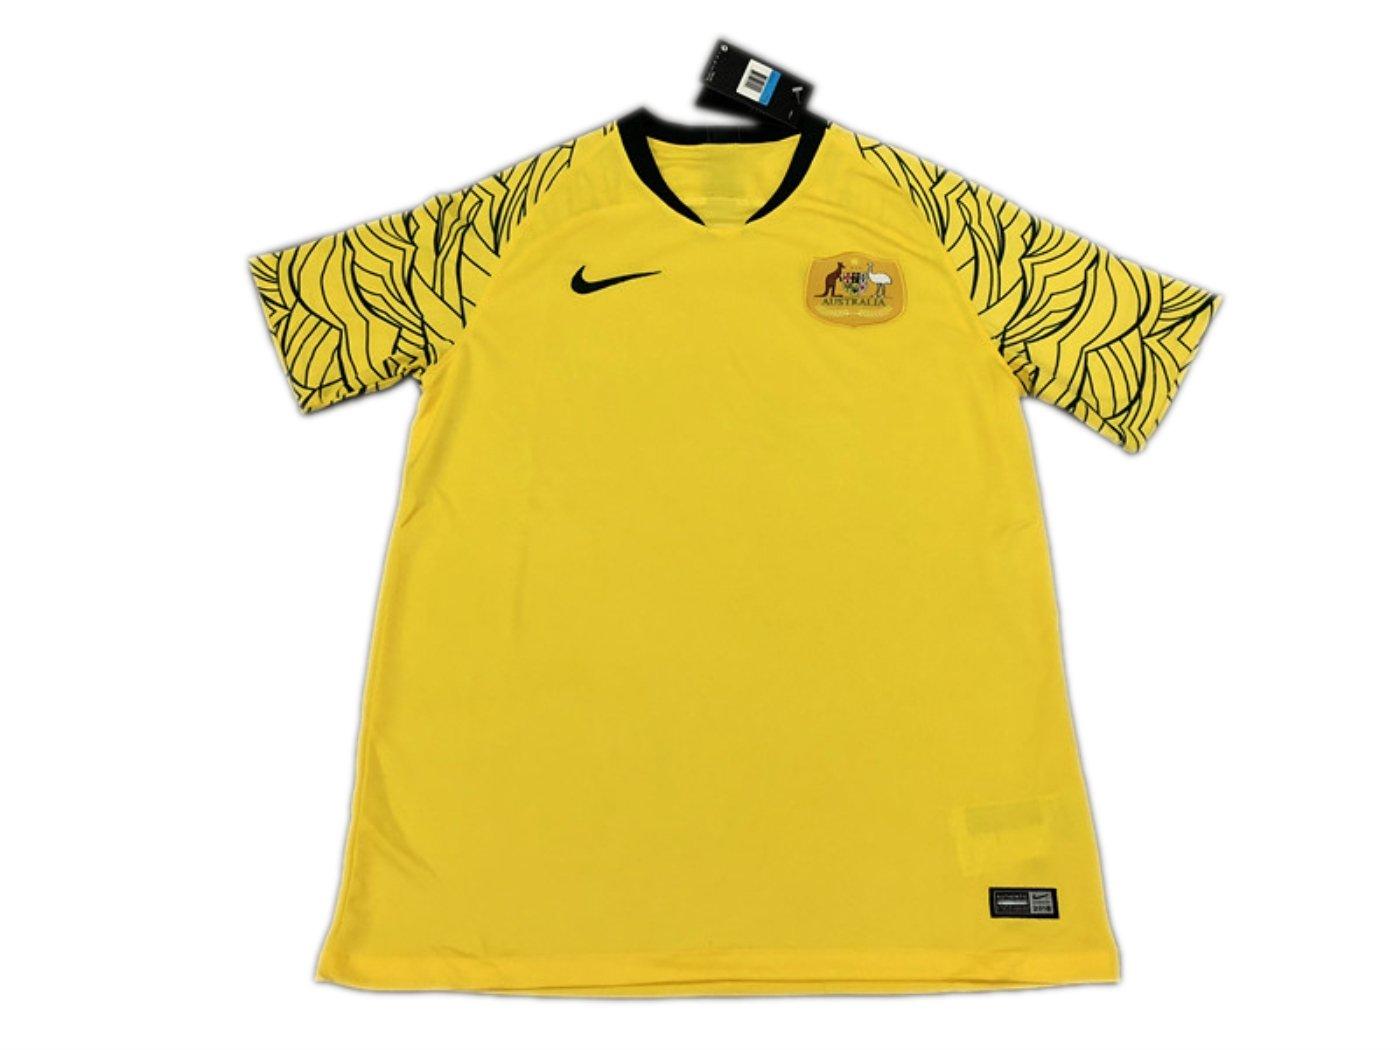 3a377e675 TI Soccer jersey Australia Home Yellow 2018 World Cup  Amazon.co.uk  Sports    Outdoors